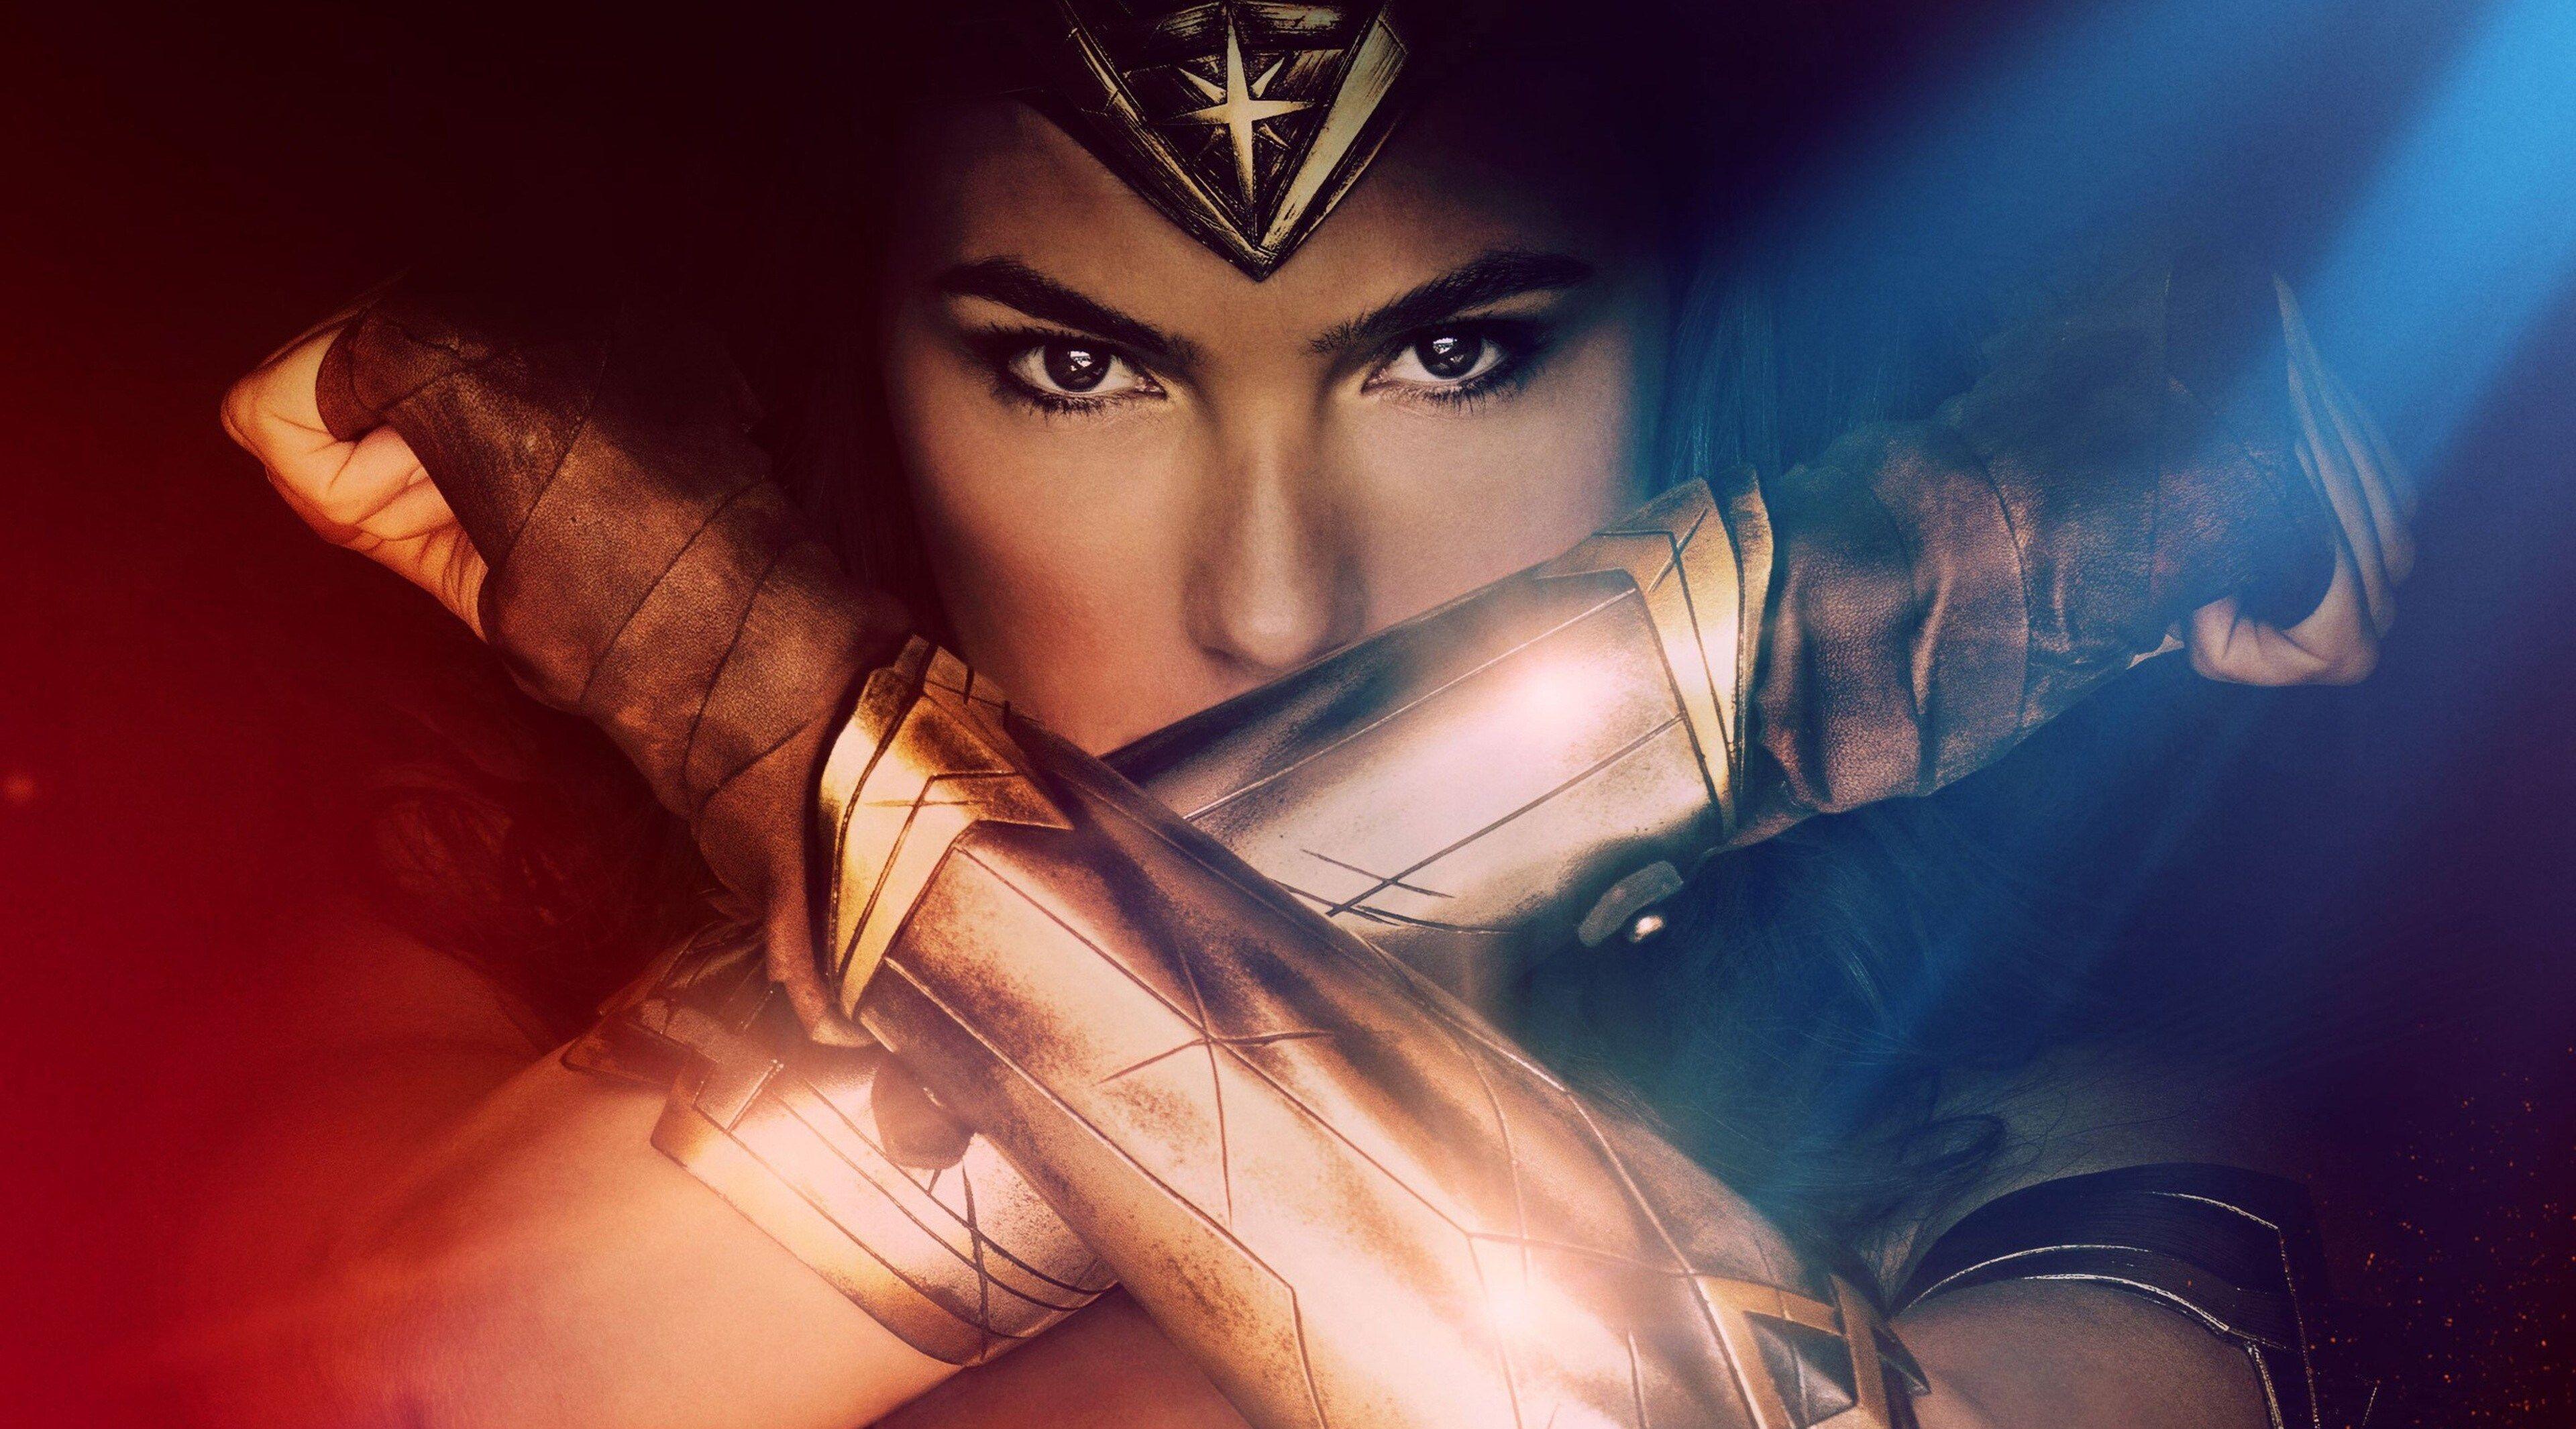 3840x2130 Wonder Woman 4k Best Wallpaper For Computer Desktop Wonder Woman Movie Gal Gadot Wonder Woman Wonder Woman